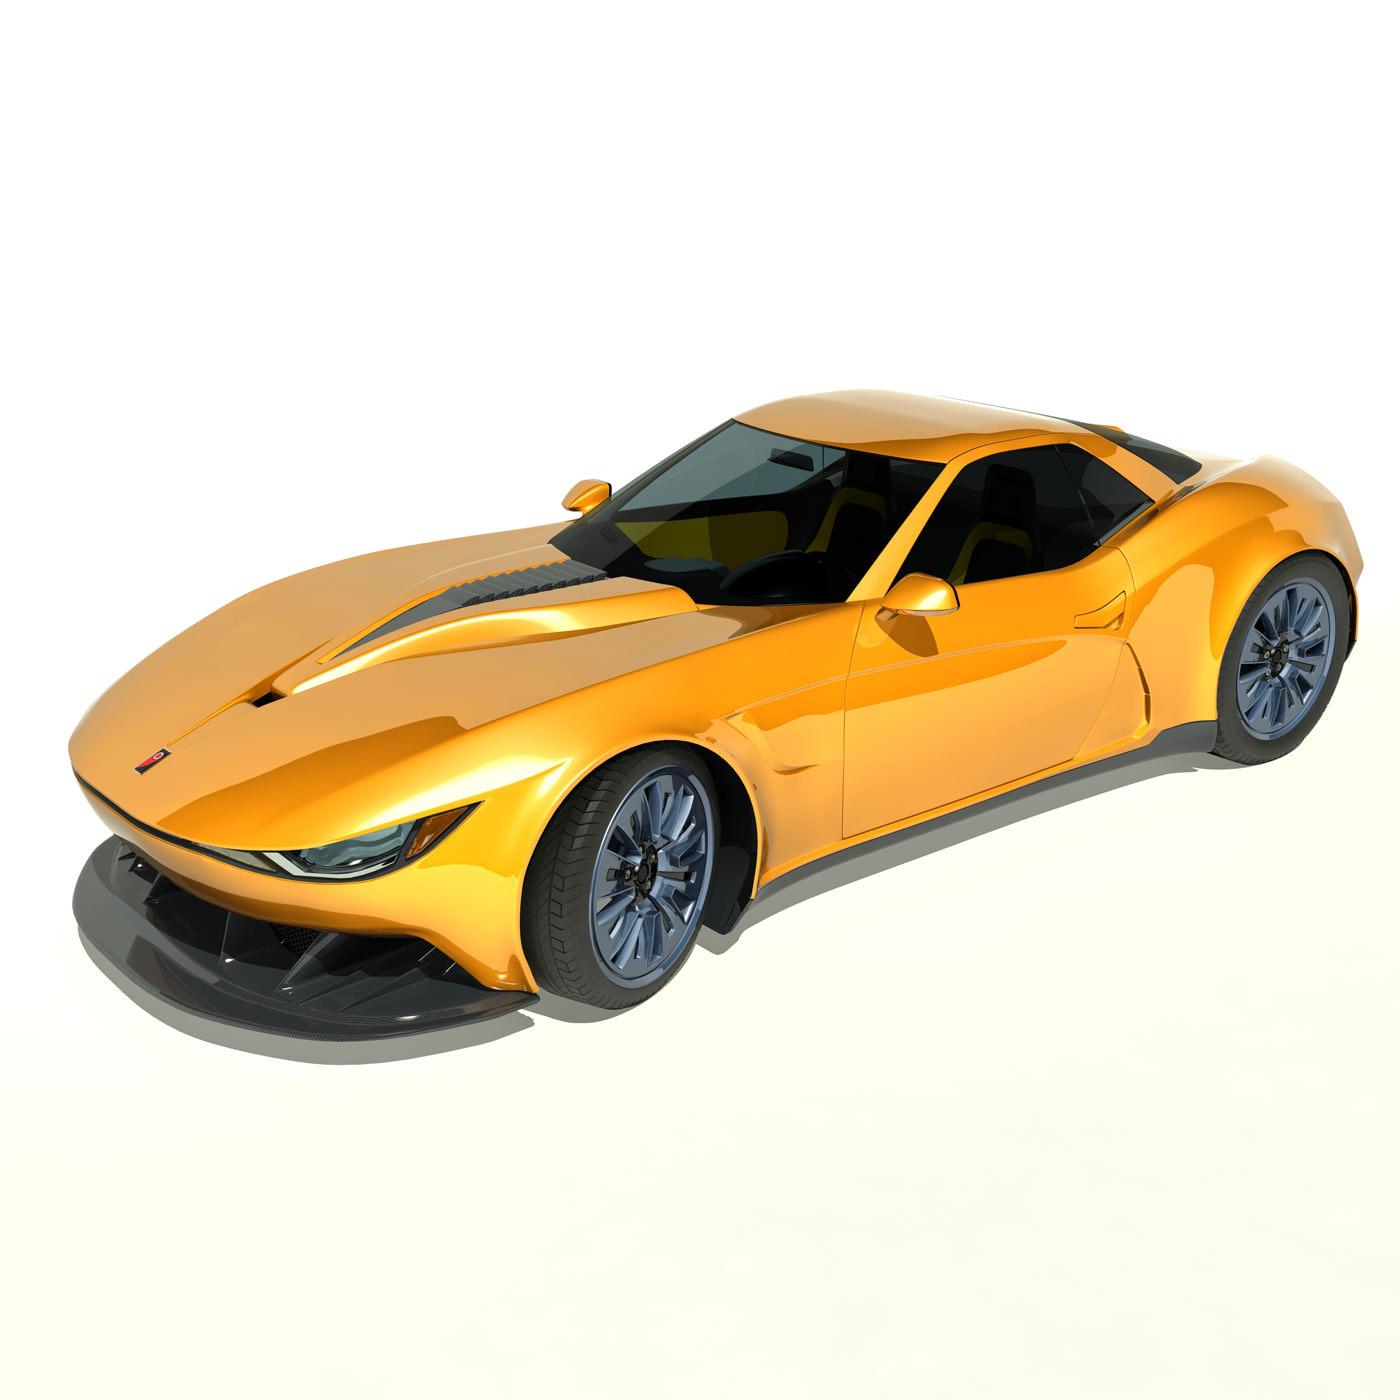 Sedan Sport Cars: 3D Model 2013 Kukhri GT Concept Sports Car